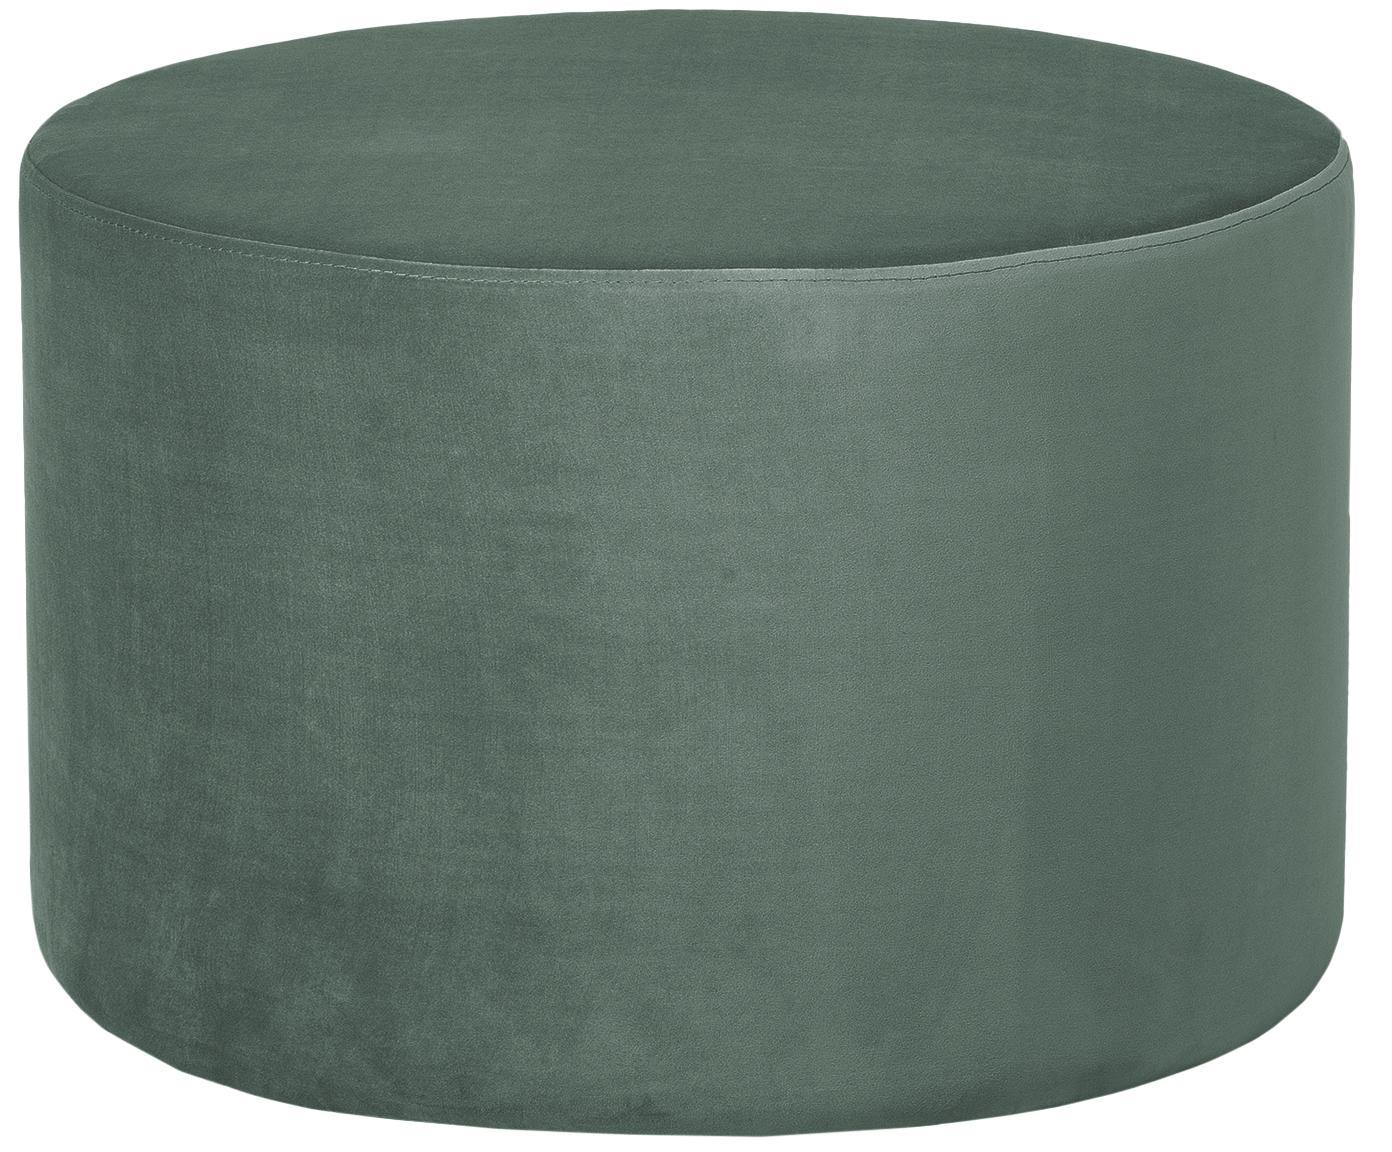 Puf de terciopelo Daisy, Tapizado: terciopelo (poliéster) 15, Estructura: tablero de fibras de dens, Verde claro, Ø 62 x Al 41 cm